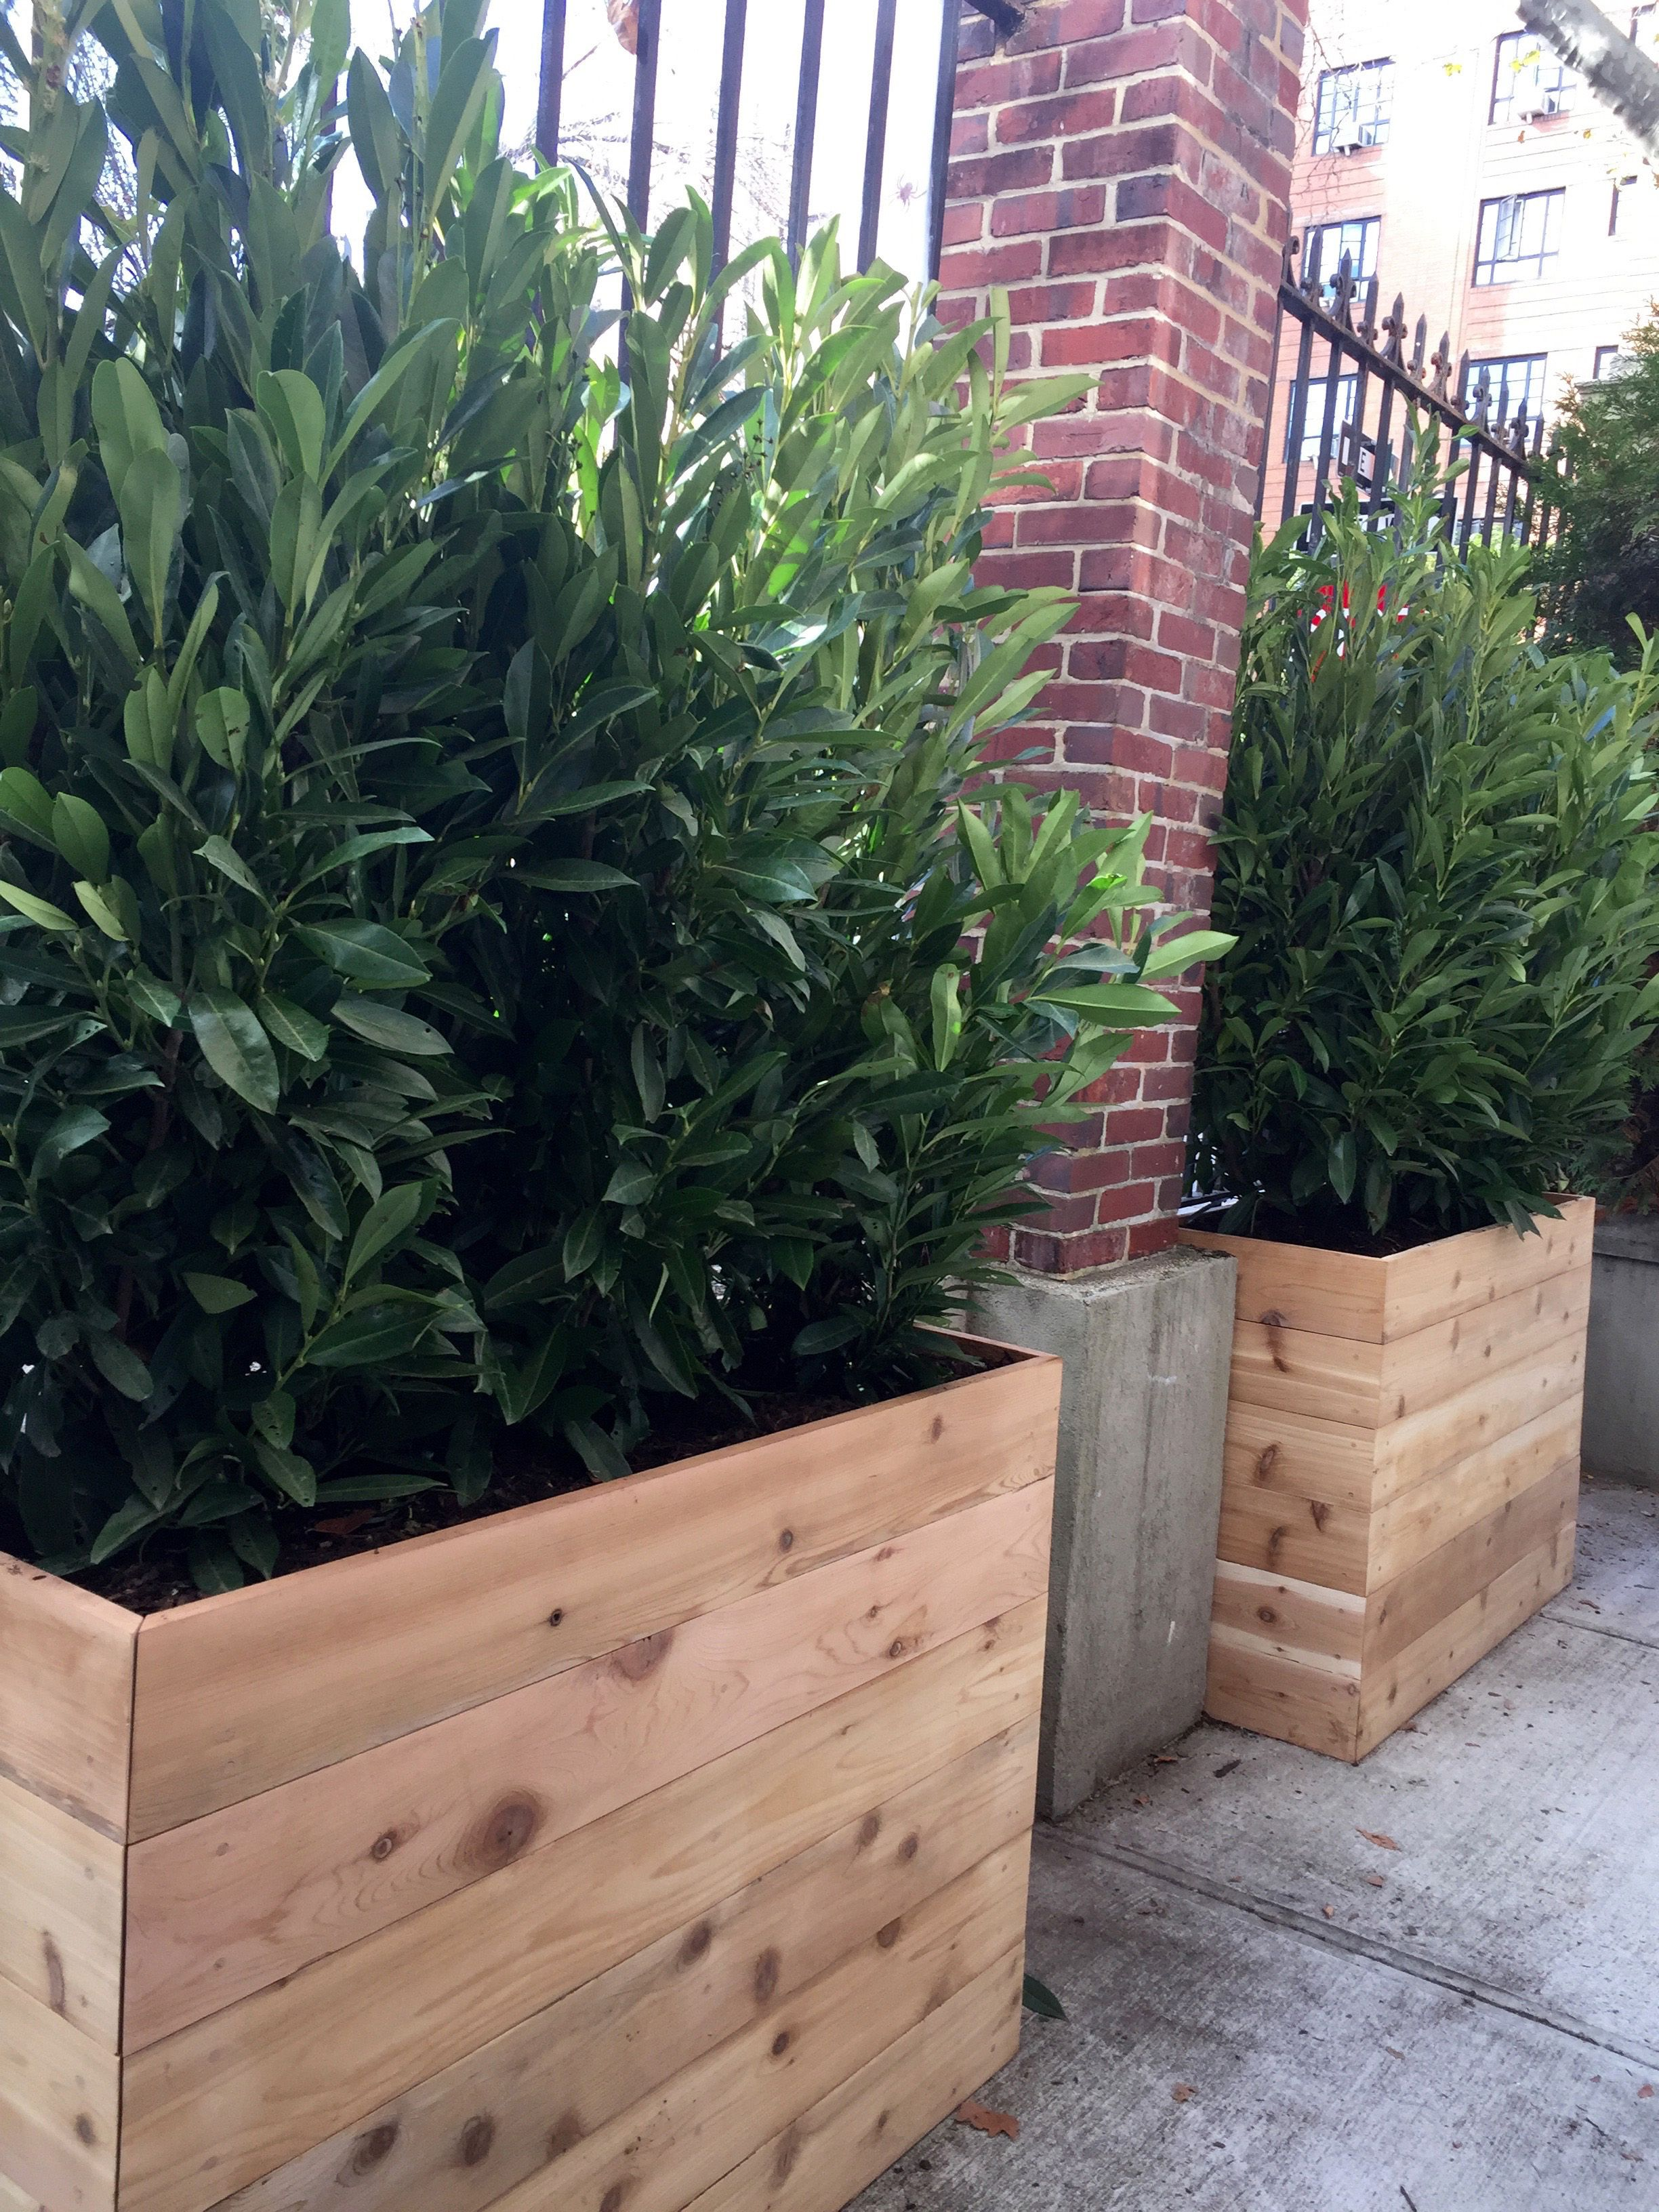 custom cedar planters with evergreen shrubs for privacy. Black Bedroom Furniture Sets. Home Design Ideas